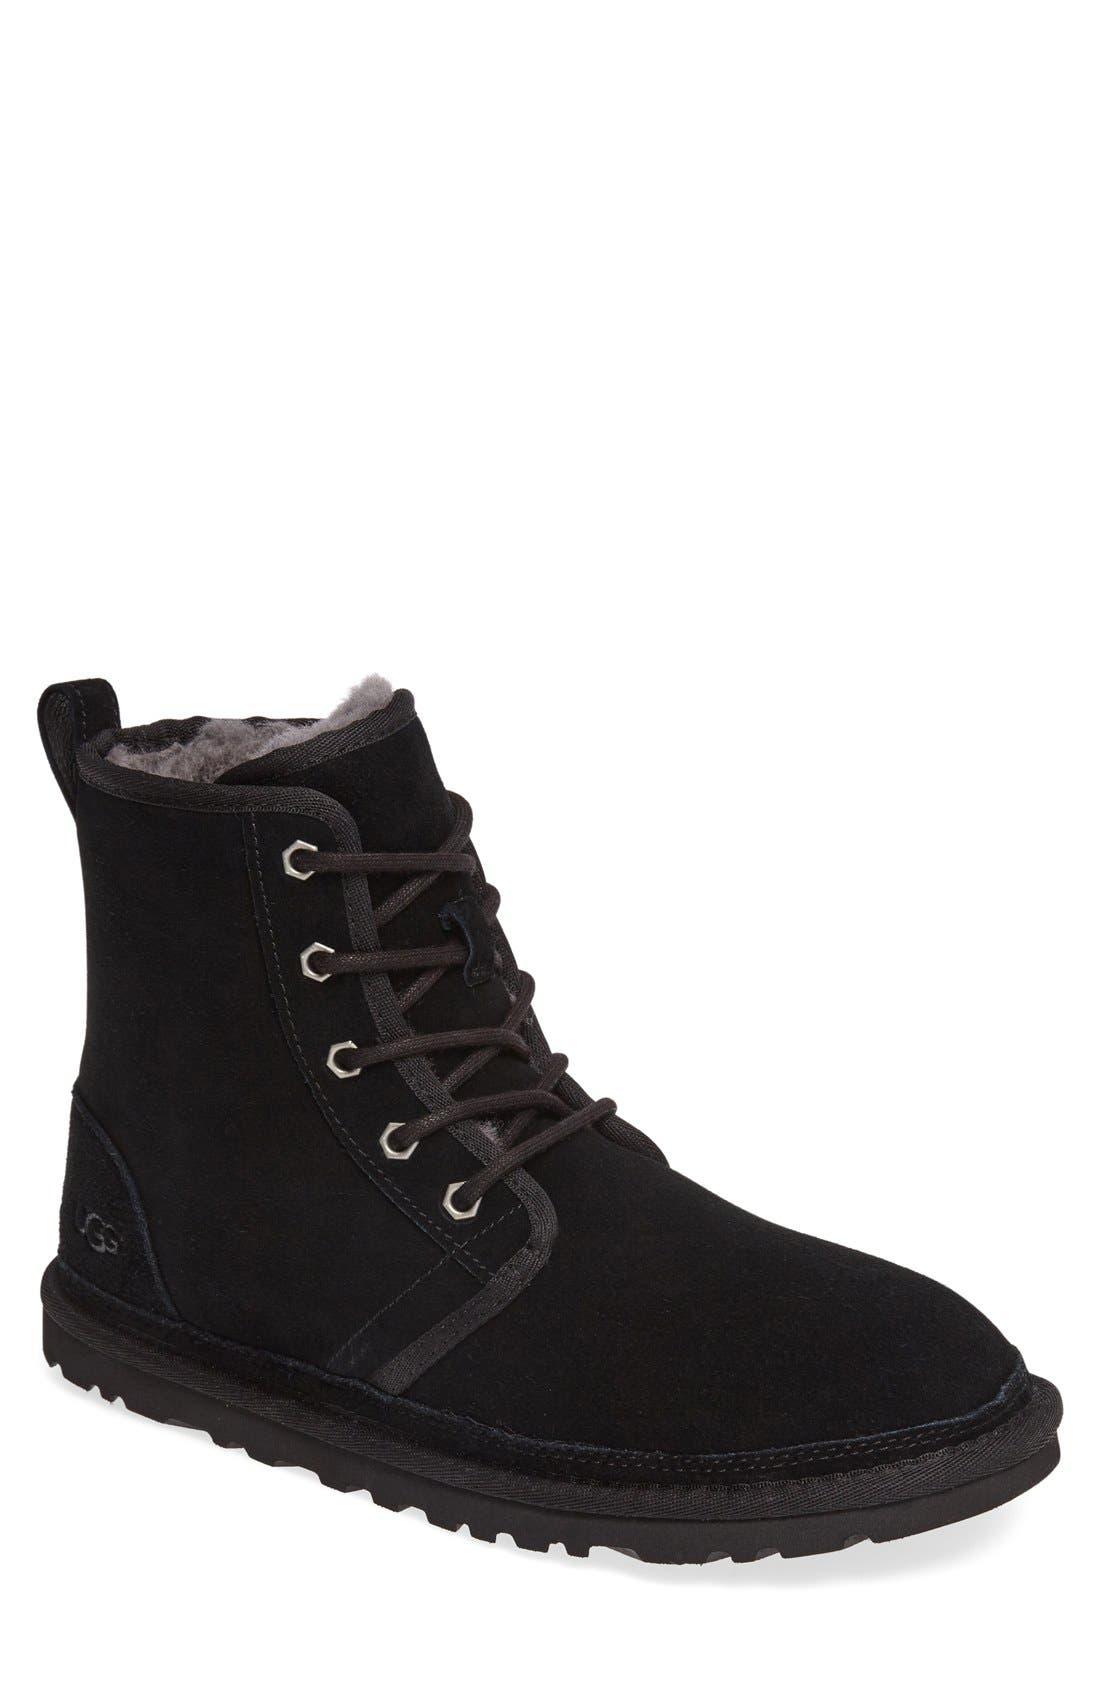 Main Image - UGG® Harkley Lace-Up Boot (Men)